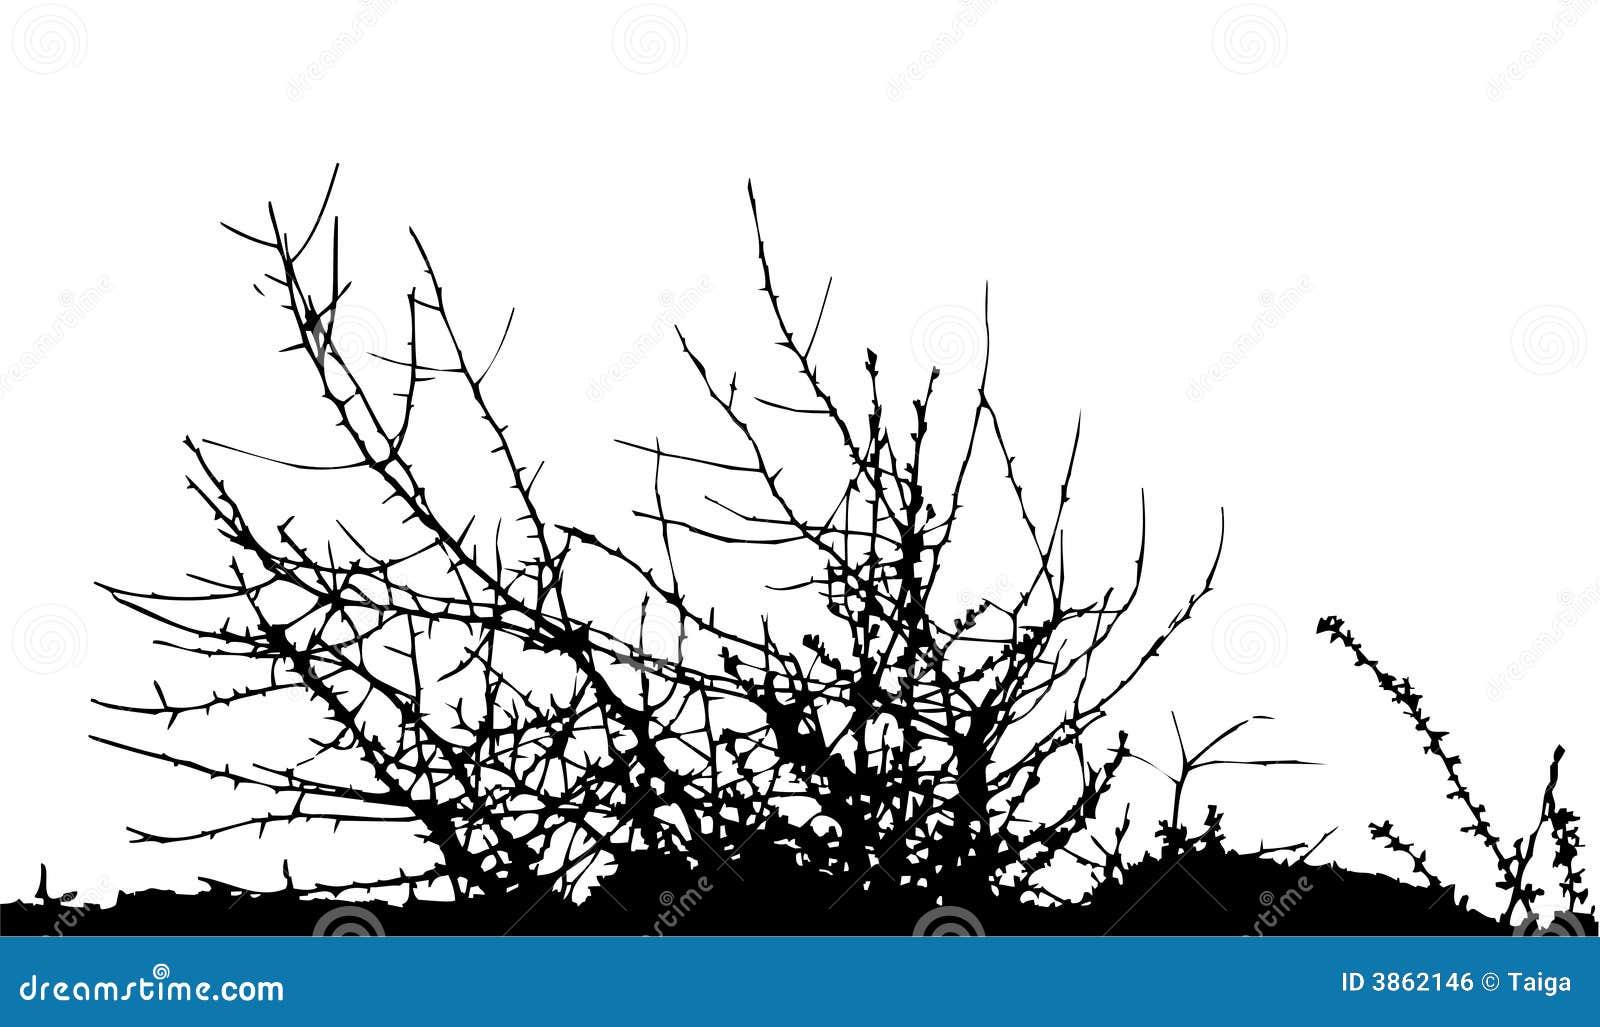 bush    silhouette    vector stock vector  illustration of